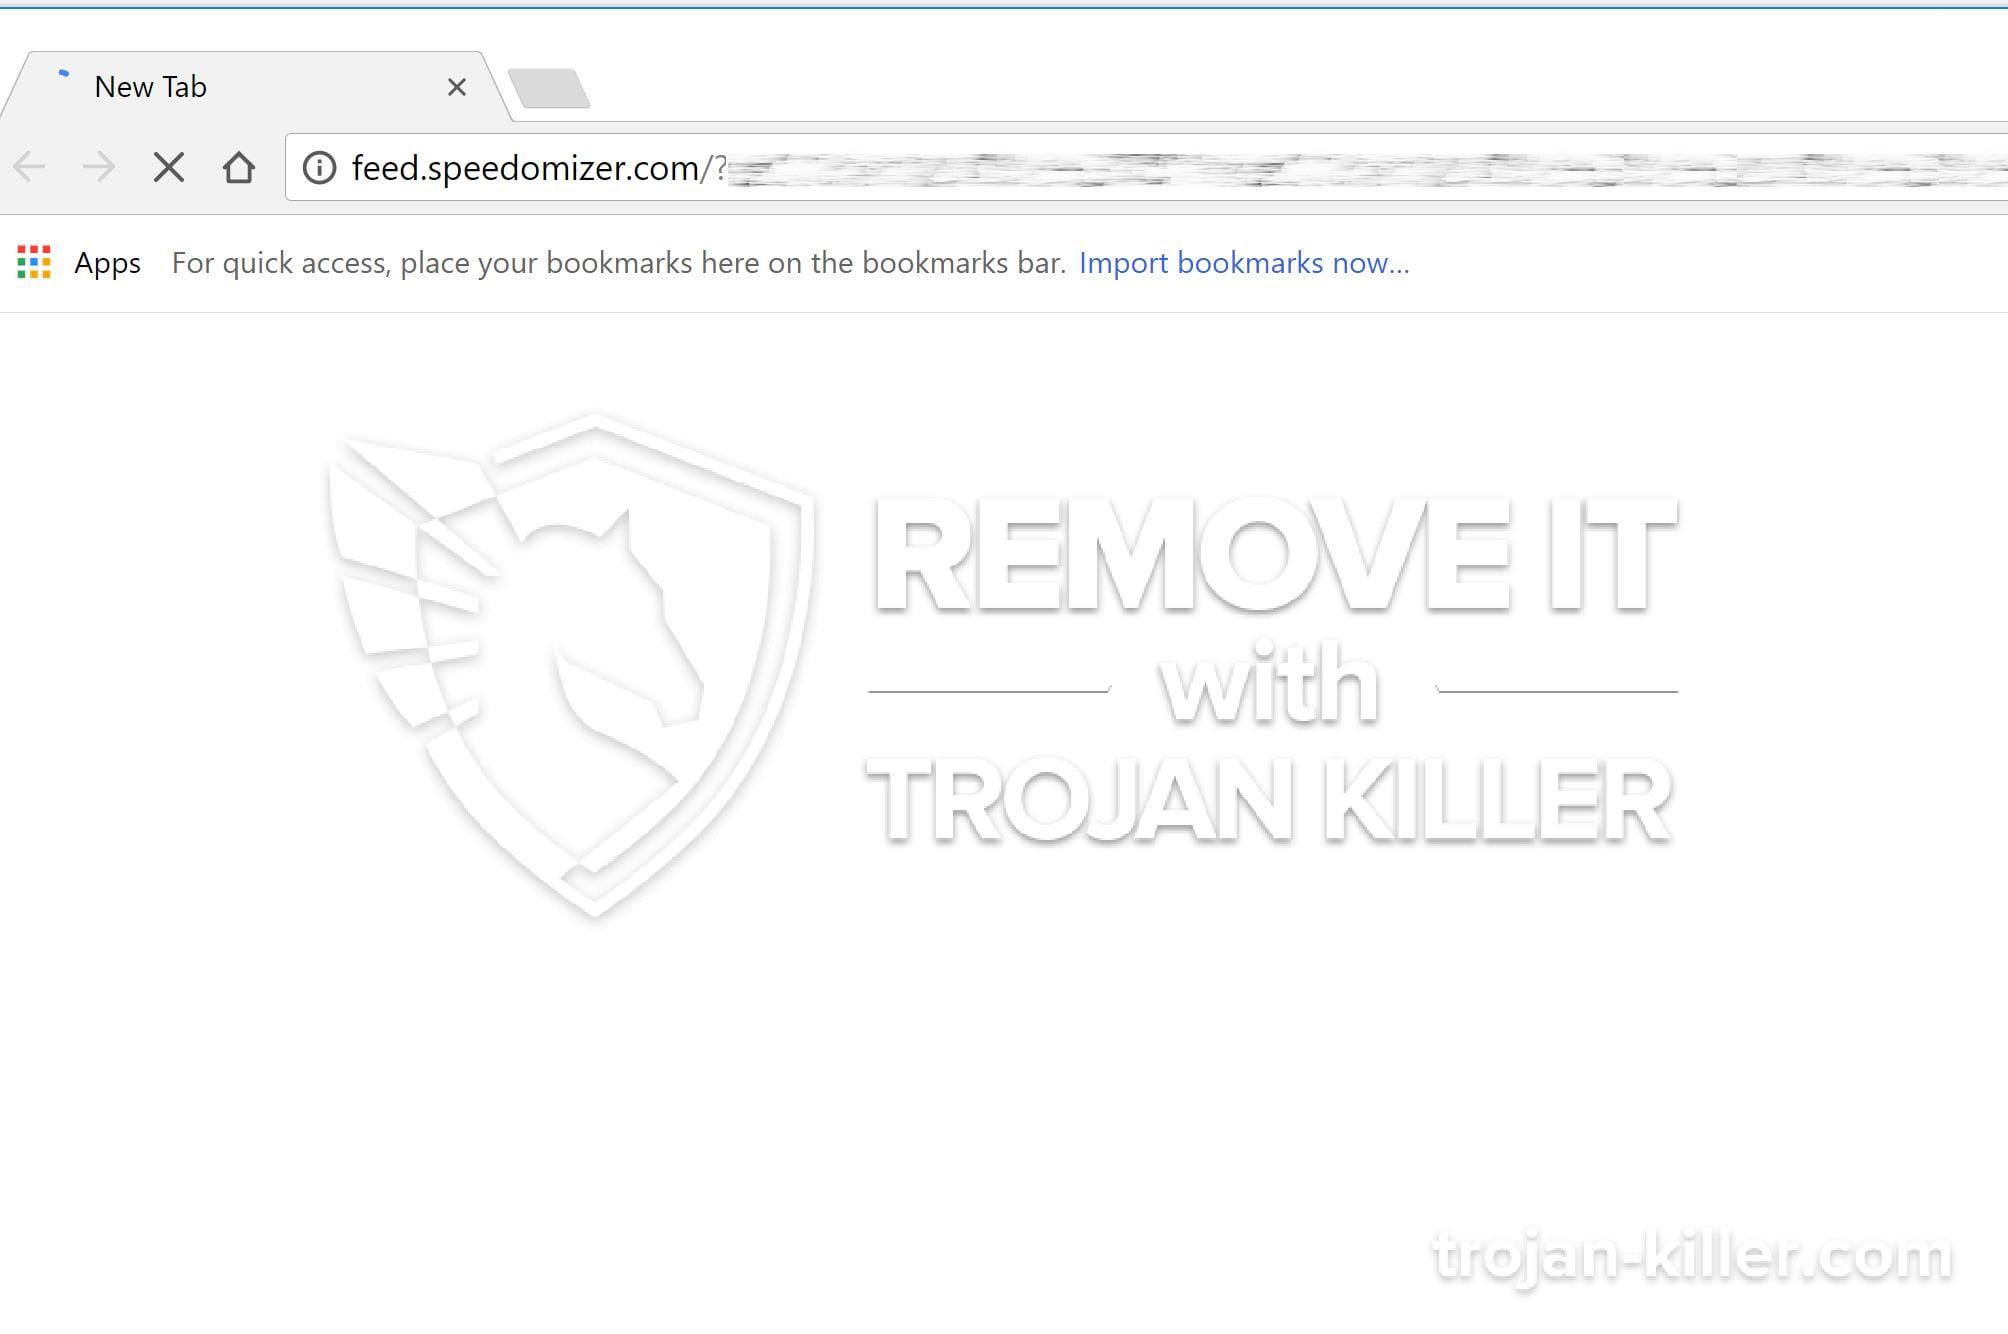 feed.speedomizer.com virus